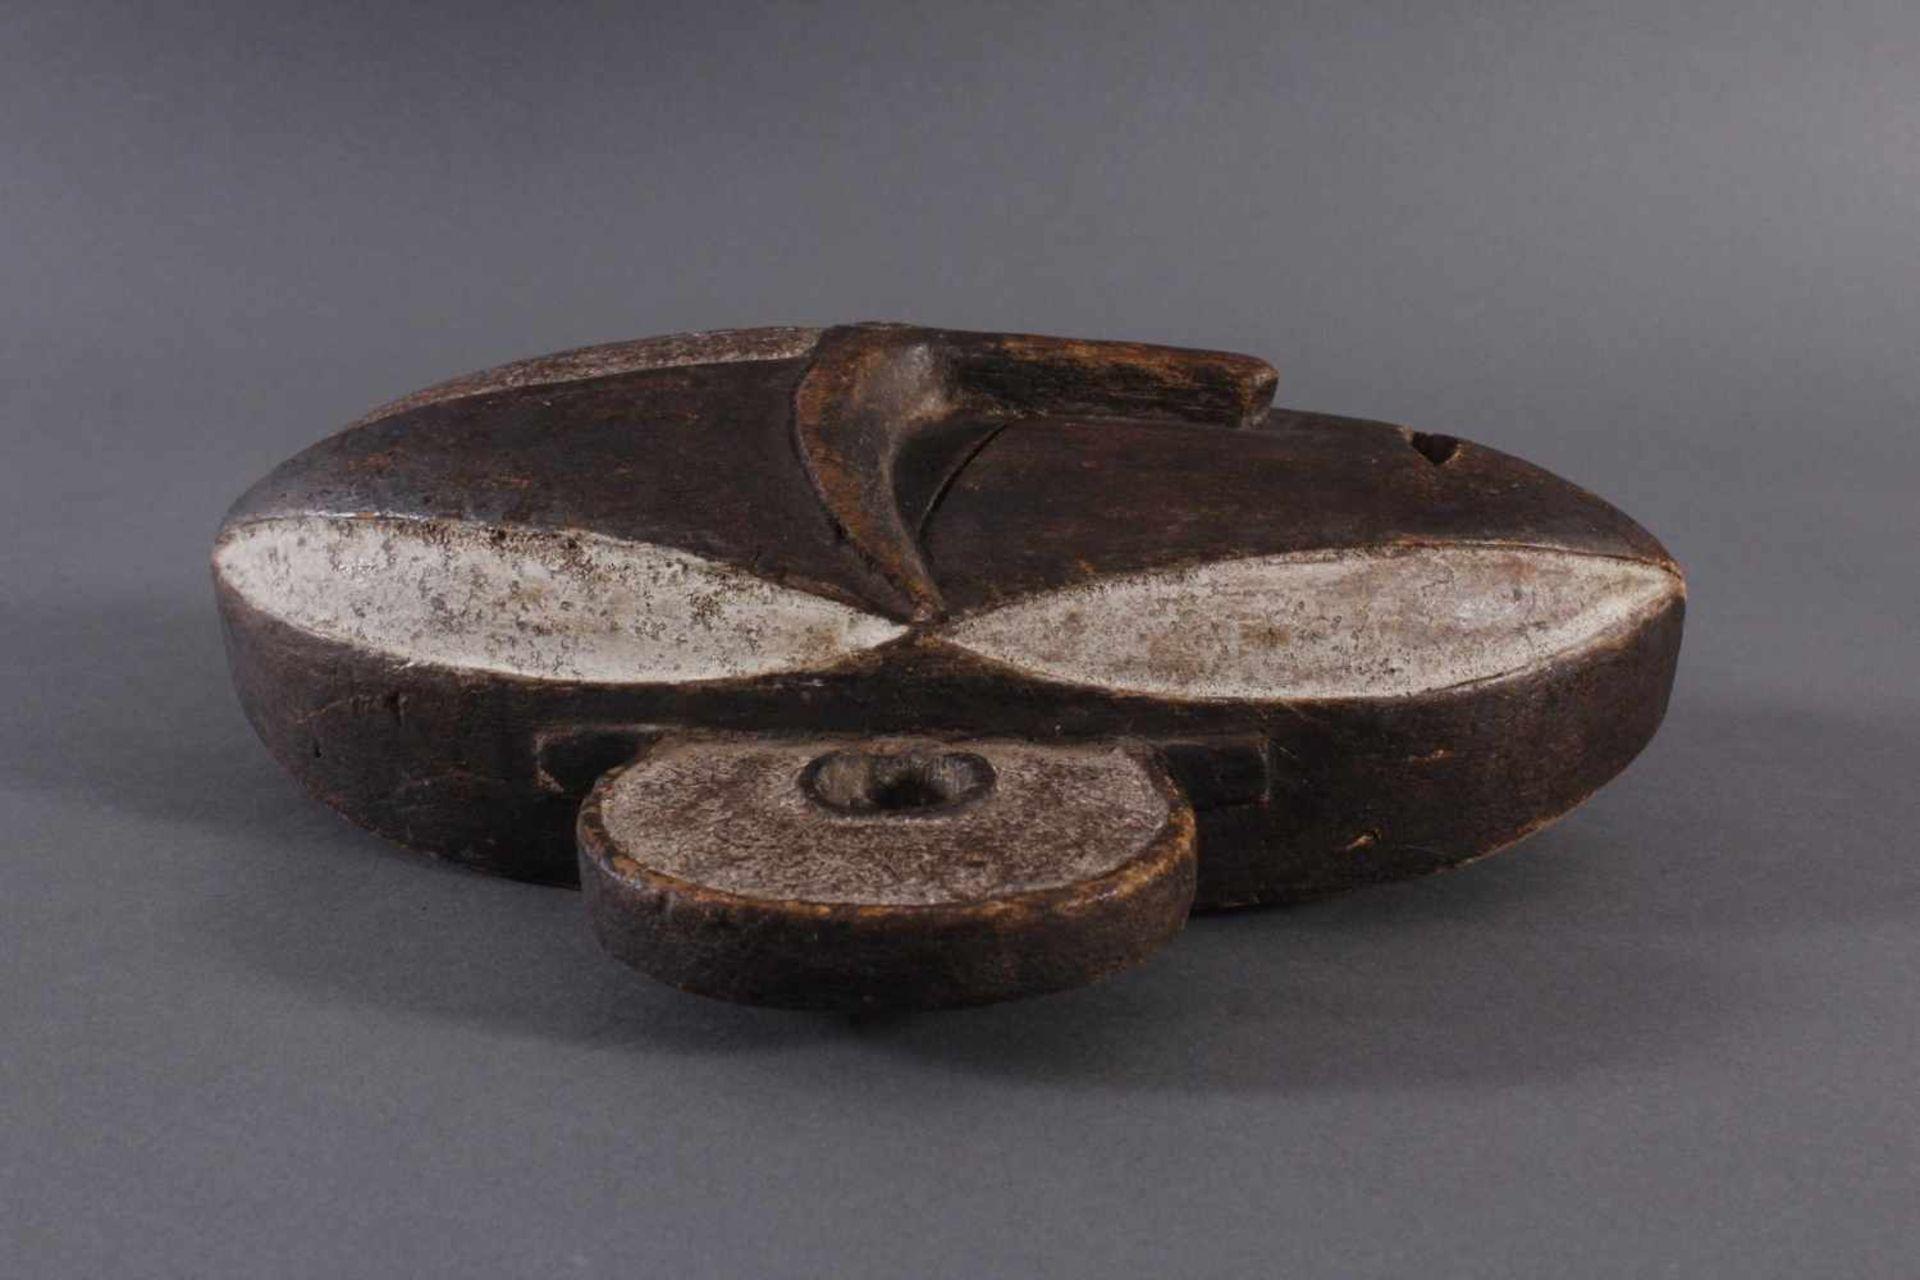 Antike Maske, Boa, Kongo 1. Hälfte 20. Jh.Holz geschnitzt, dunkle Patina, Reste weißer Bemalung, - Bild 3 aus 6